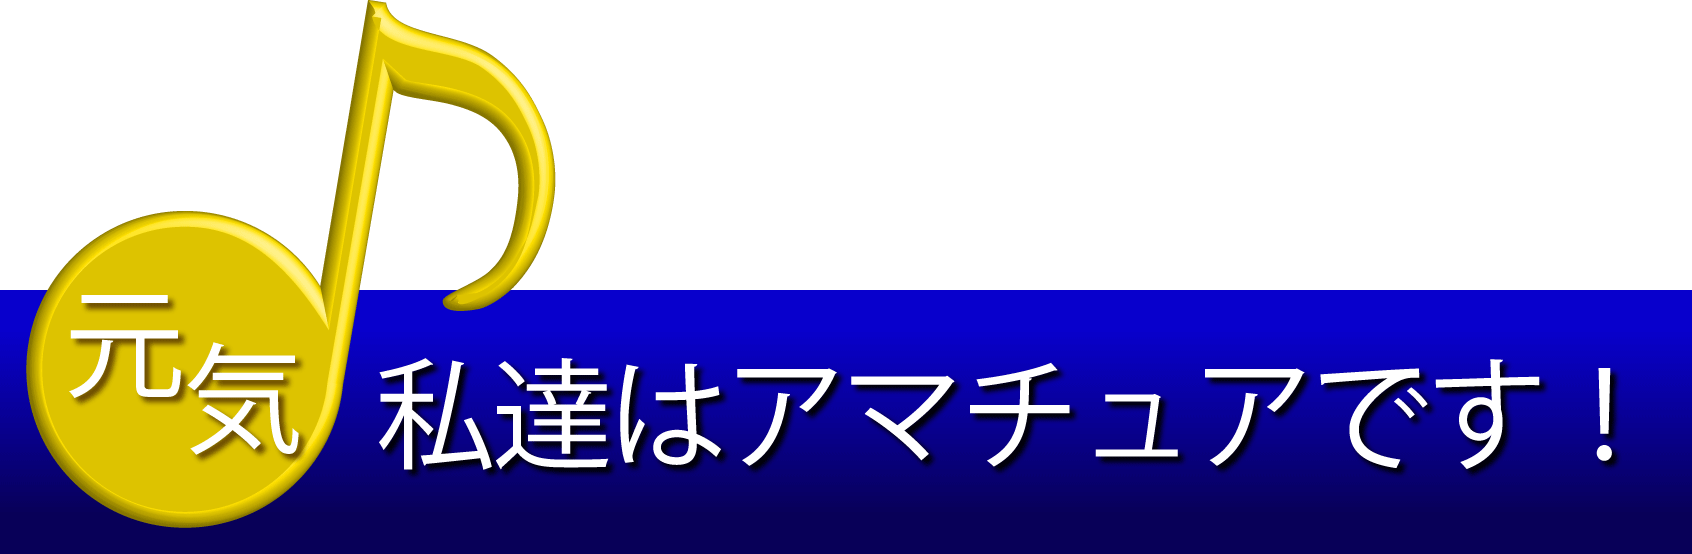 banner_HP-basic01_06_genki@2x